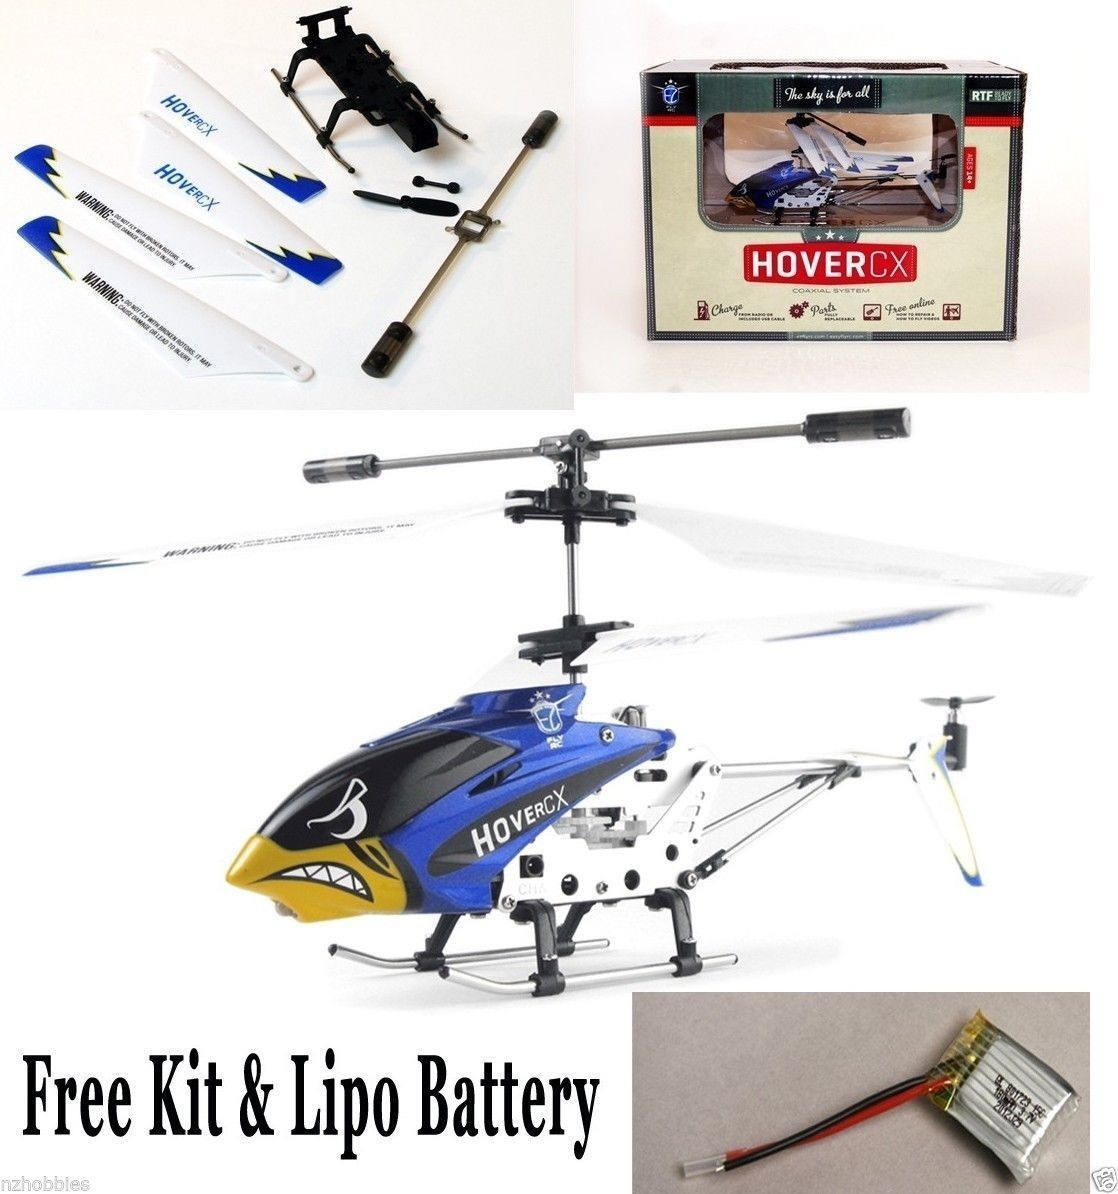 EZFly RC Hover CX Mini RTF 3 Ch Heli w/ BLUE Canopy w/ Free  sc 1 st  Pinterest & EZFly RC Hover CX Mini RTF 3 Ch Heli w/ BLUE Canopy w/ Free Kit ...